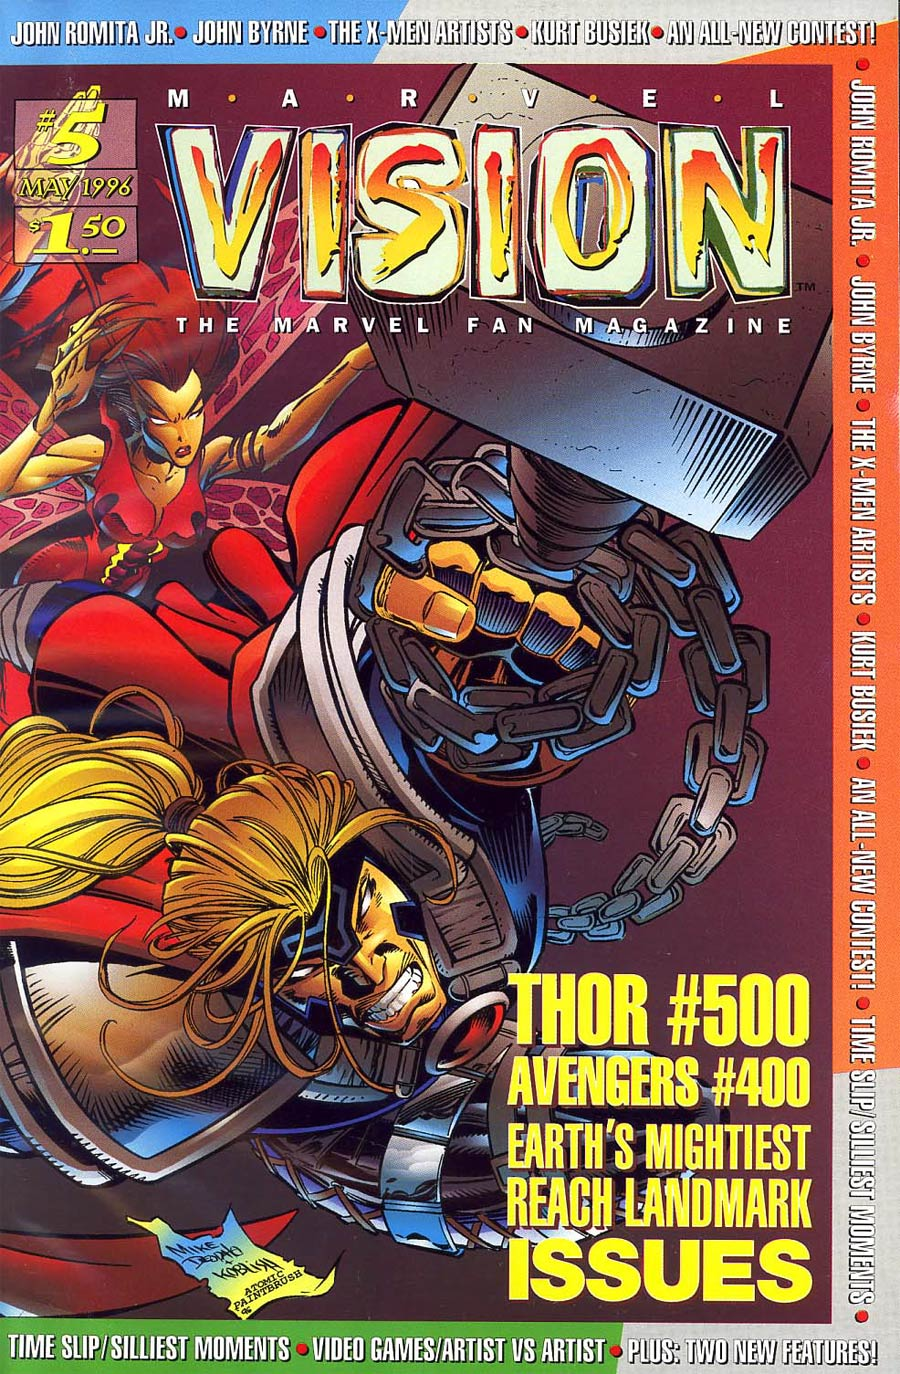 Marvel Vision #5